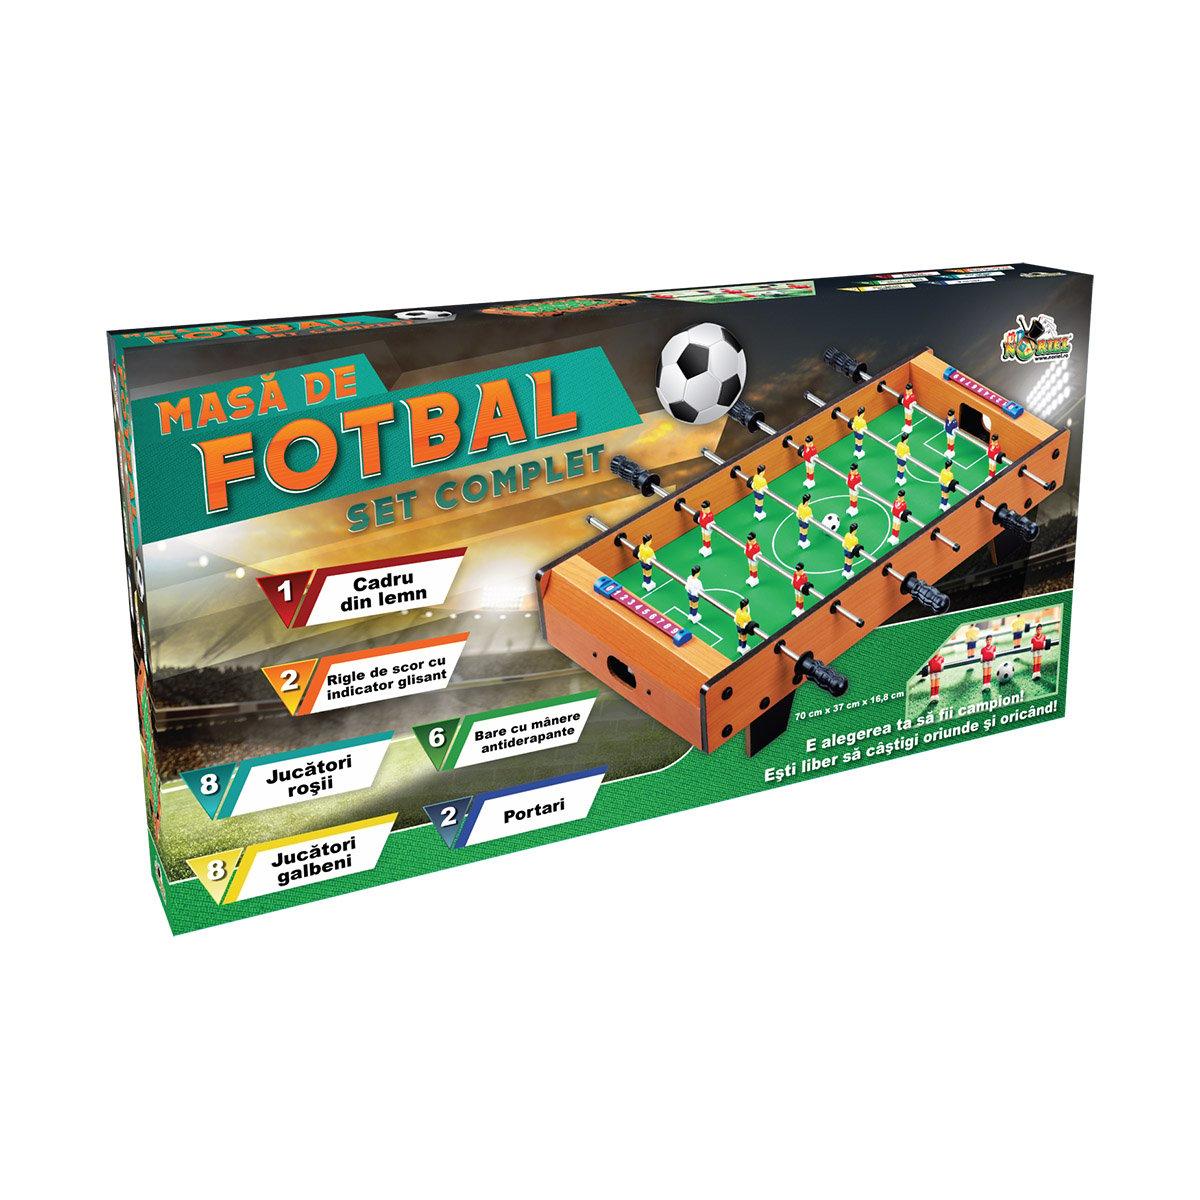 Masa de fotbal din lemn Noriel Games, 70 cm